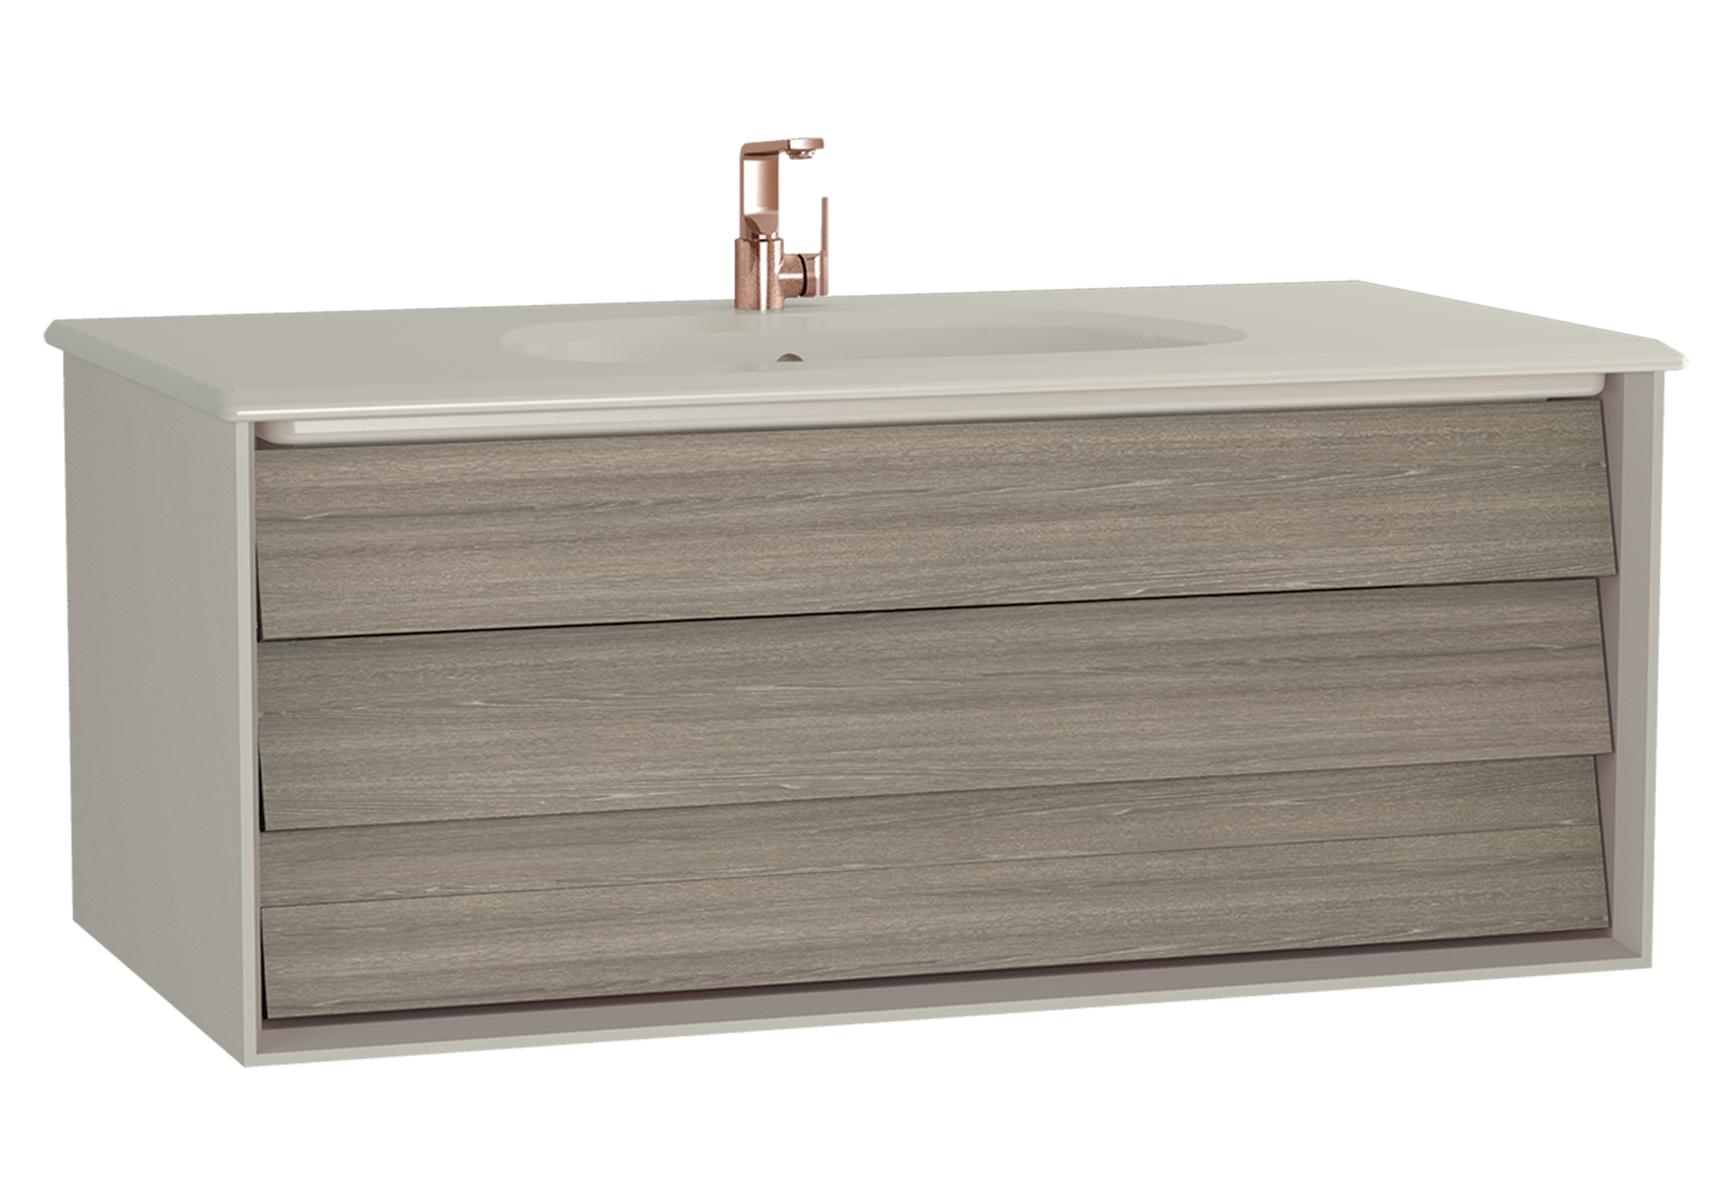 Frame meuble avec plan céramique, 102,5 cm, chêne moka, mat taupe, avec blanc plan céramique